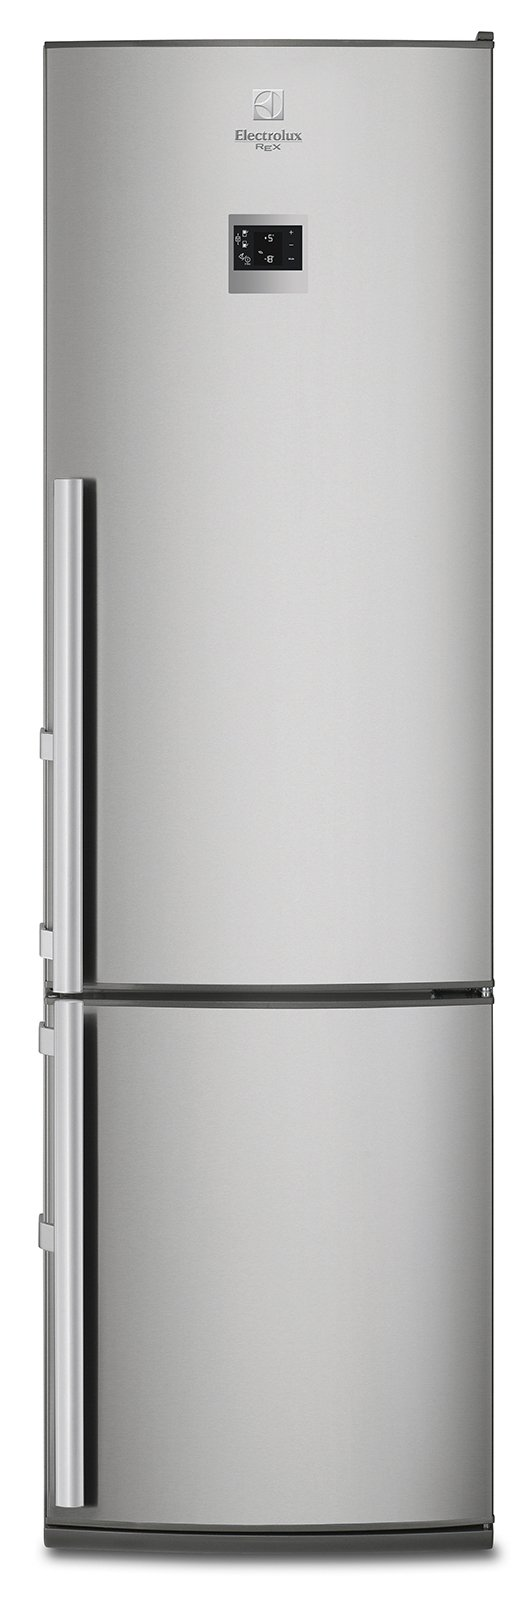 electolux-RN3881-frigorifero